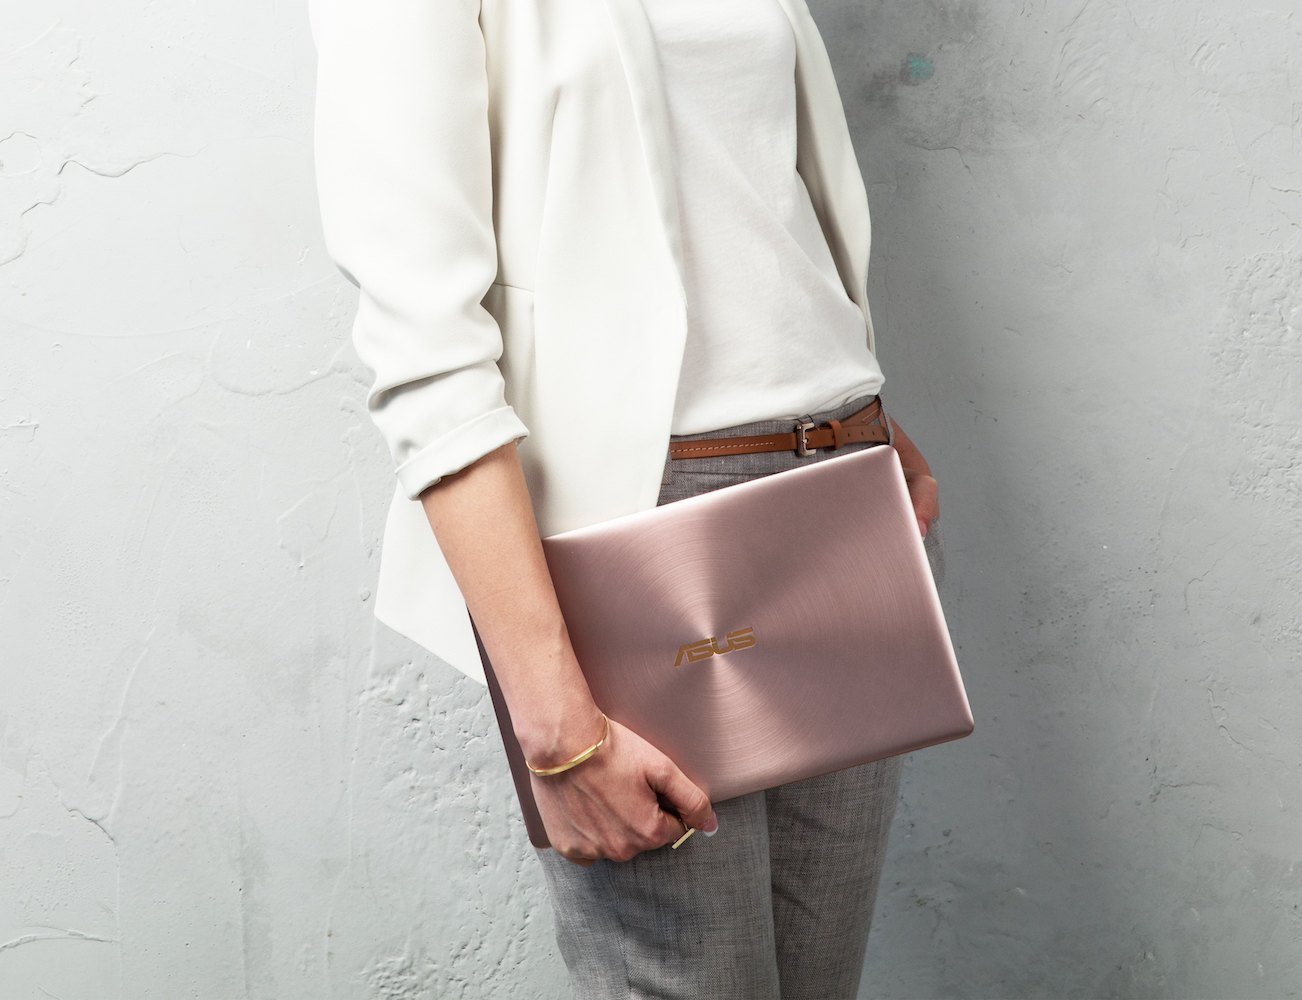 ASUS+ZenBook+3+Laptop